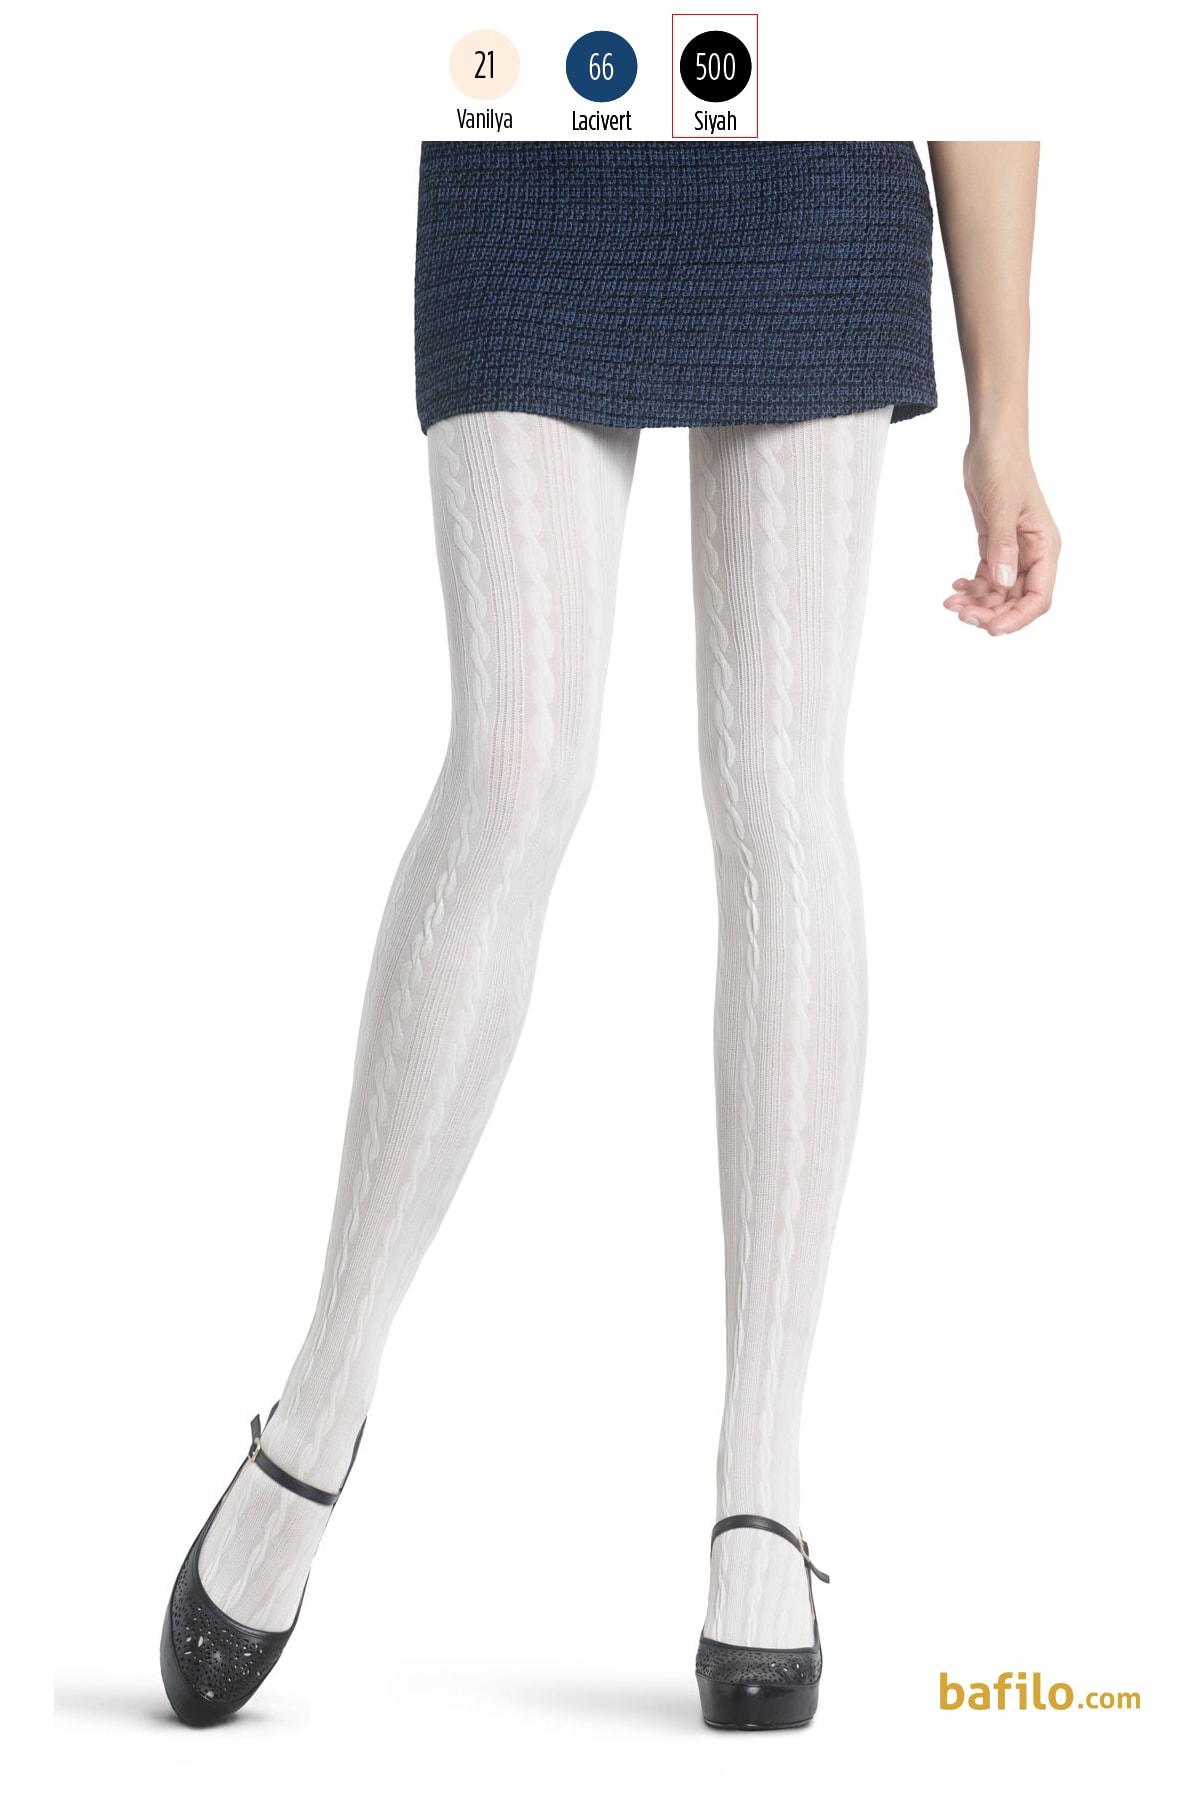 پنتی | Penti - جوراب شلواری طرح دار زنانه پنتی  Marlen مشکی